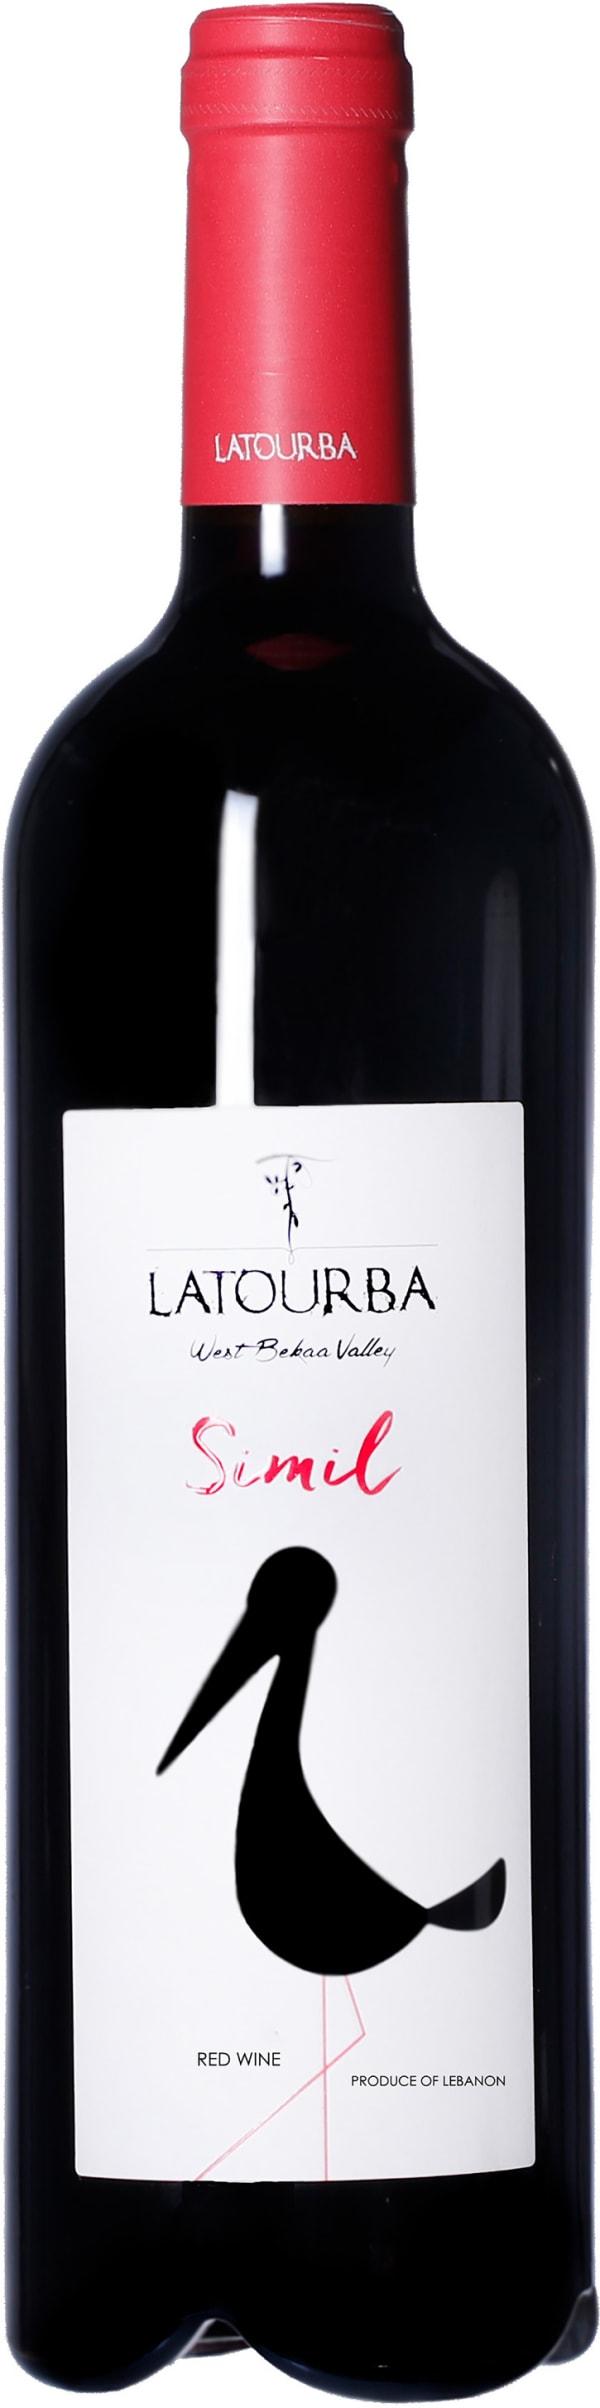 Latourba Simil 2016